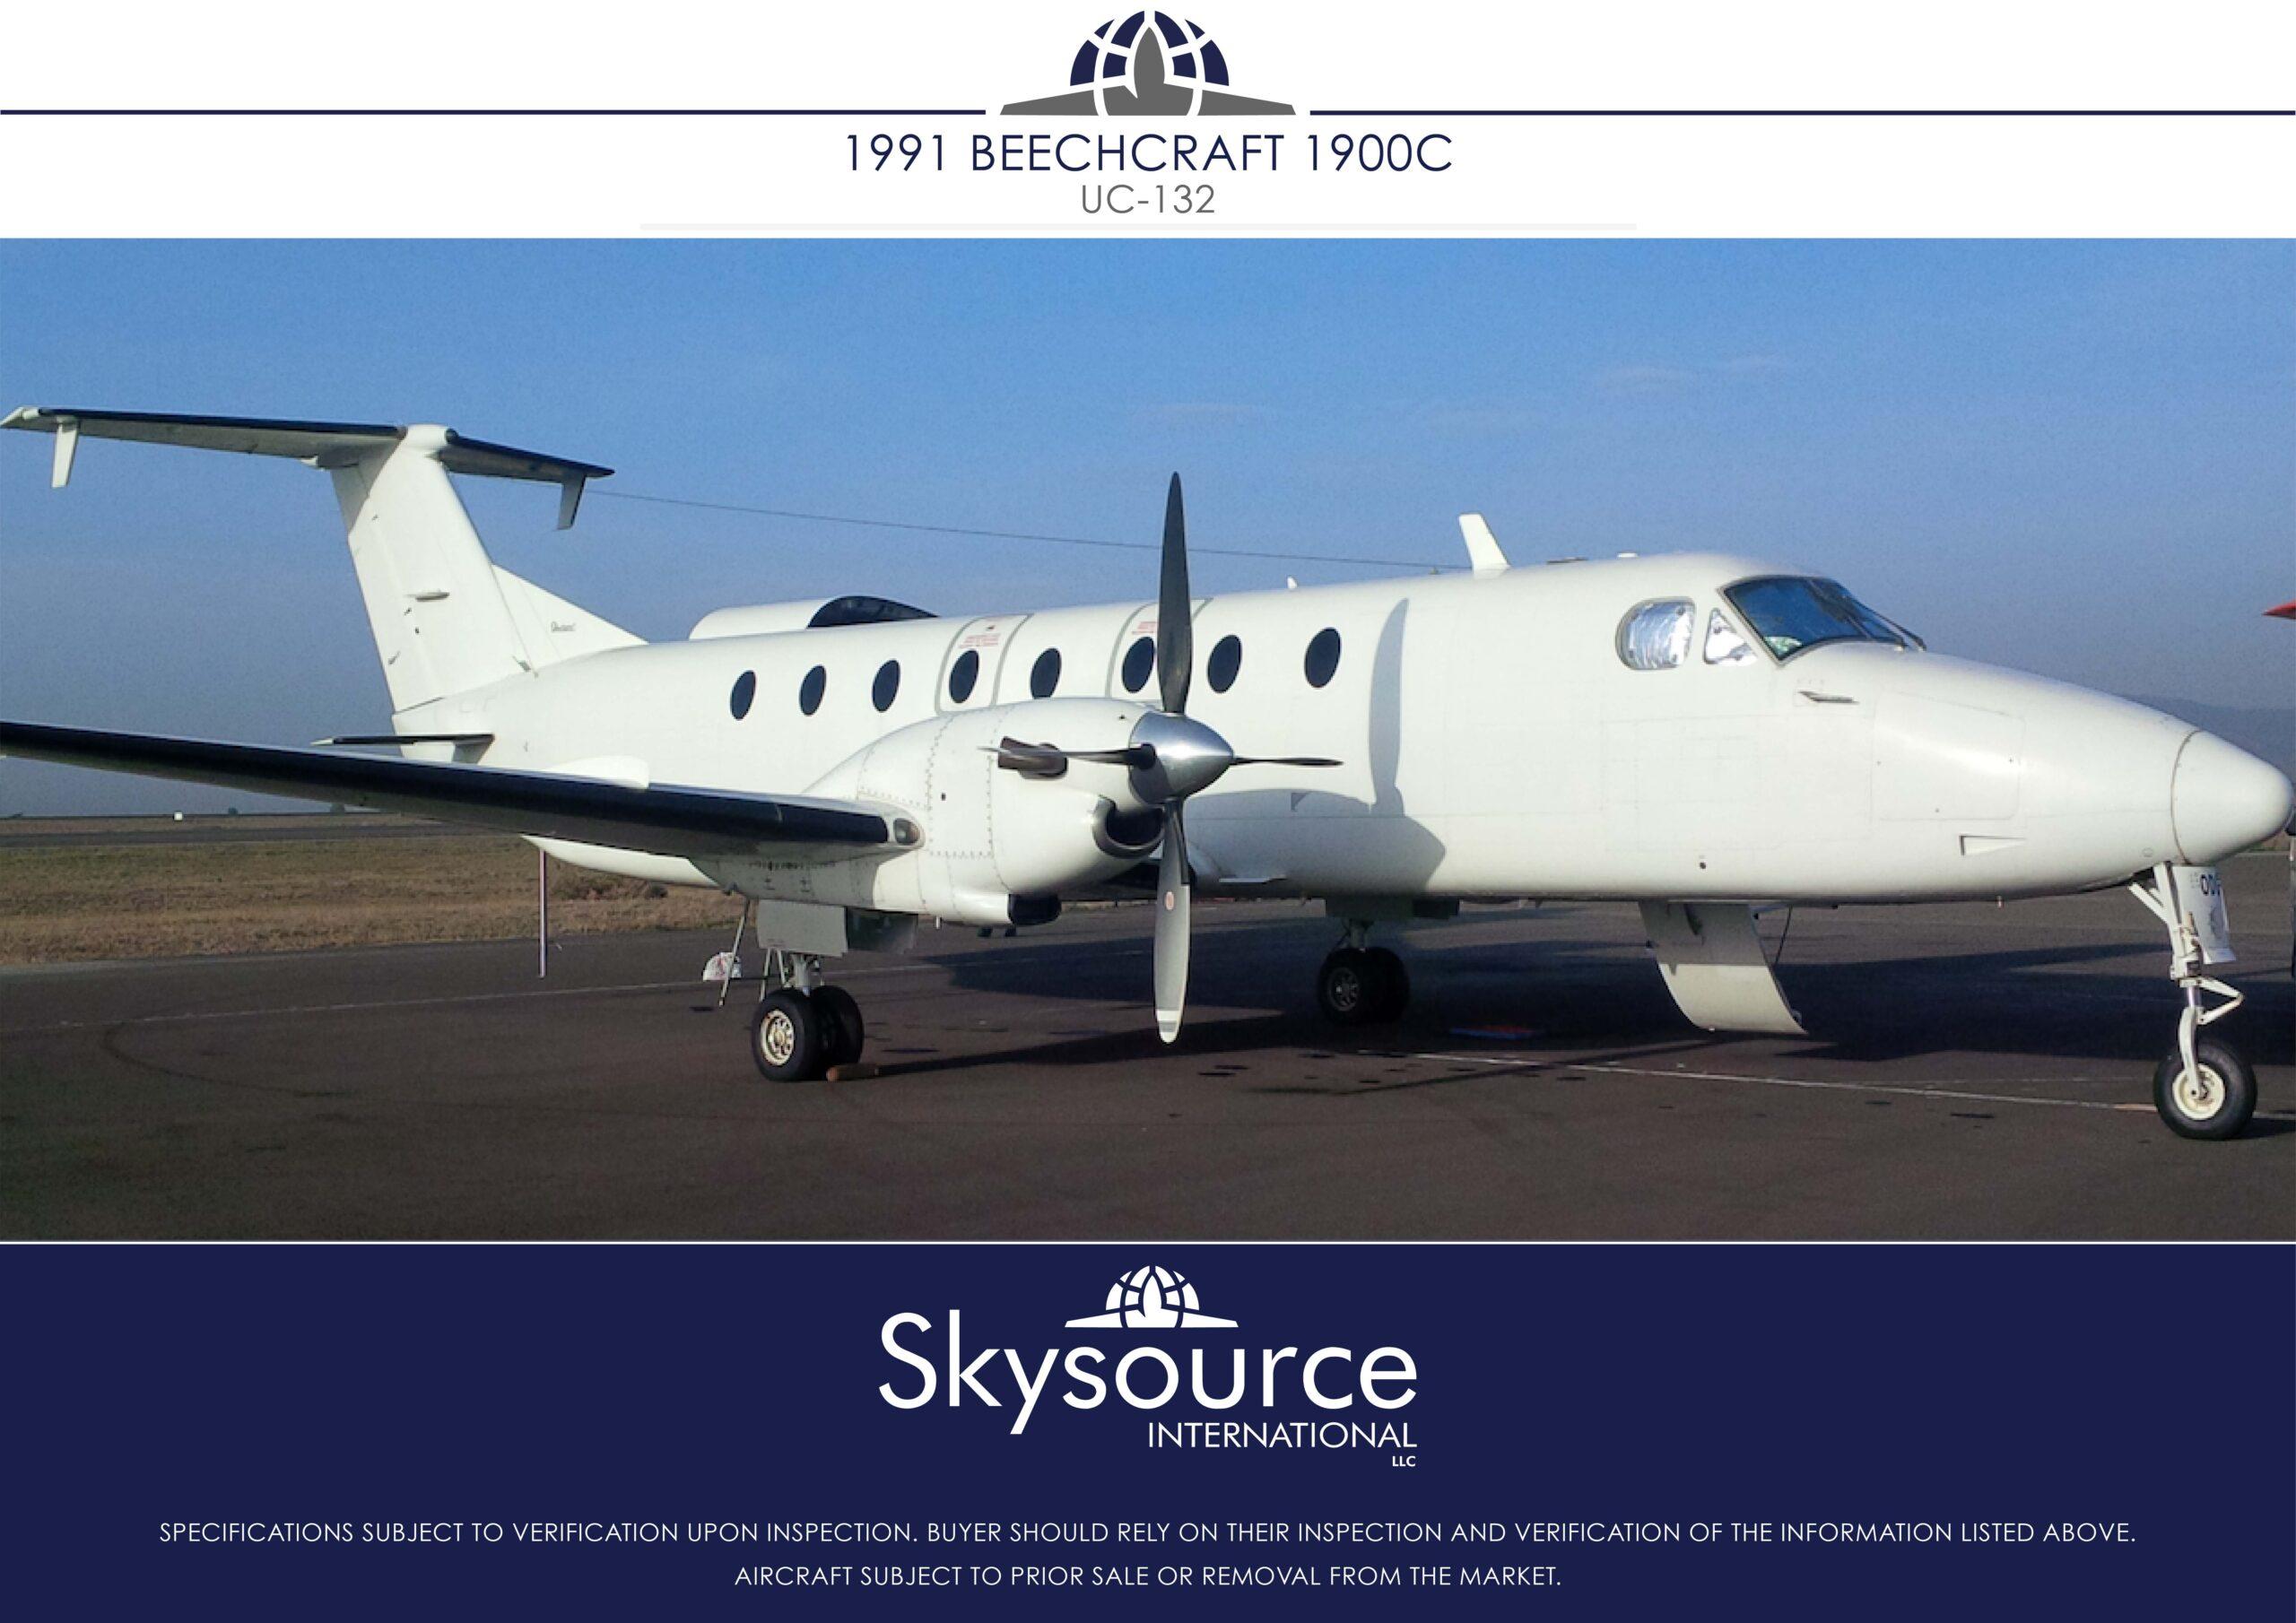 SS 1991 Beechcraft 1900C